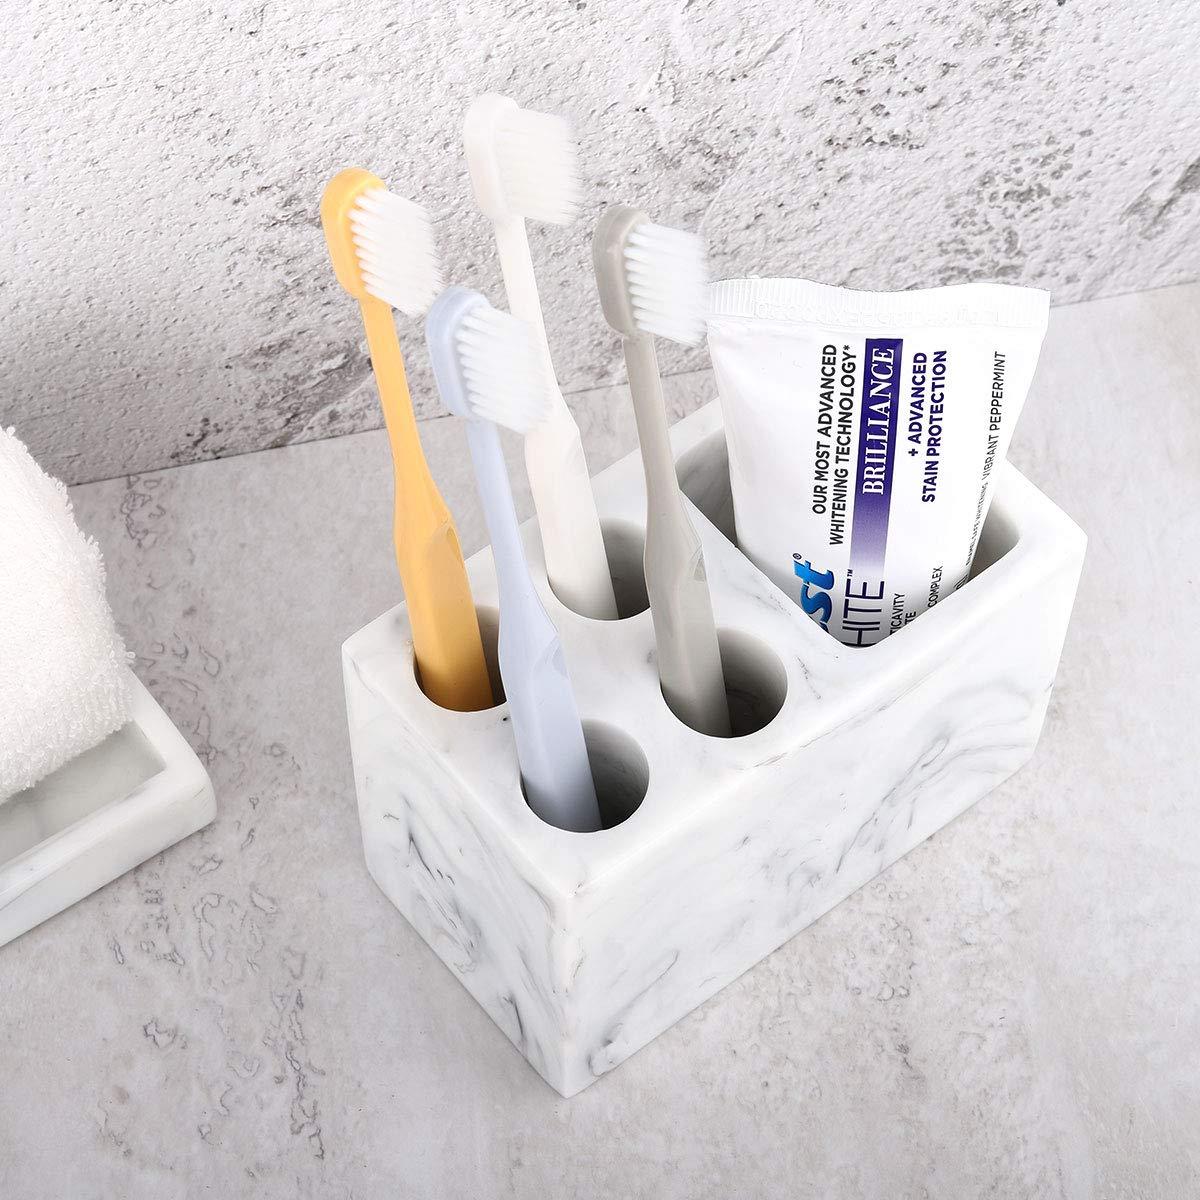 Toothpaste Ink White Razor Luxspire Resin Toothbrush Holder 3 Slots Hygienic Handmade Toothbrush Storage Stand Dispenser Bathroom Organizer Set for Electric Toothbrush